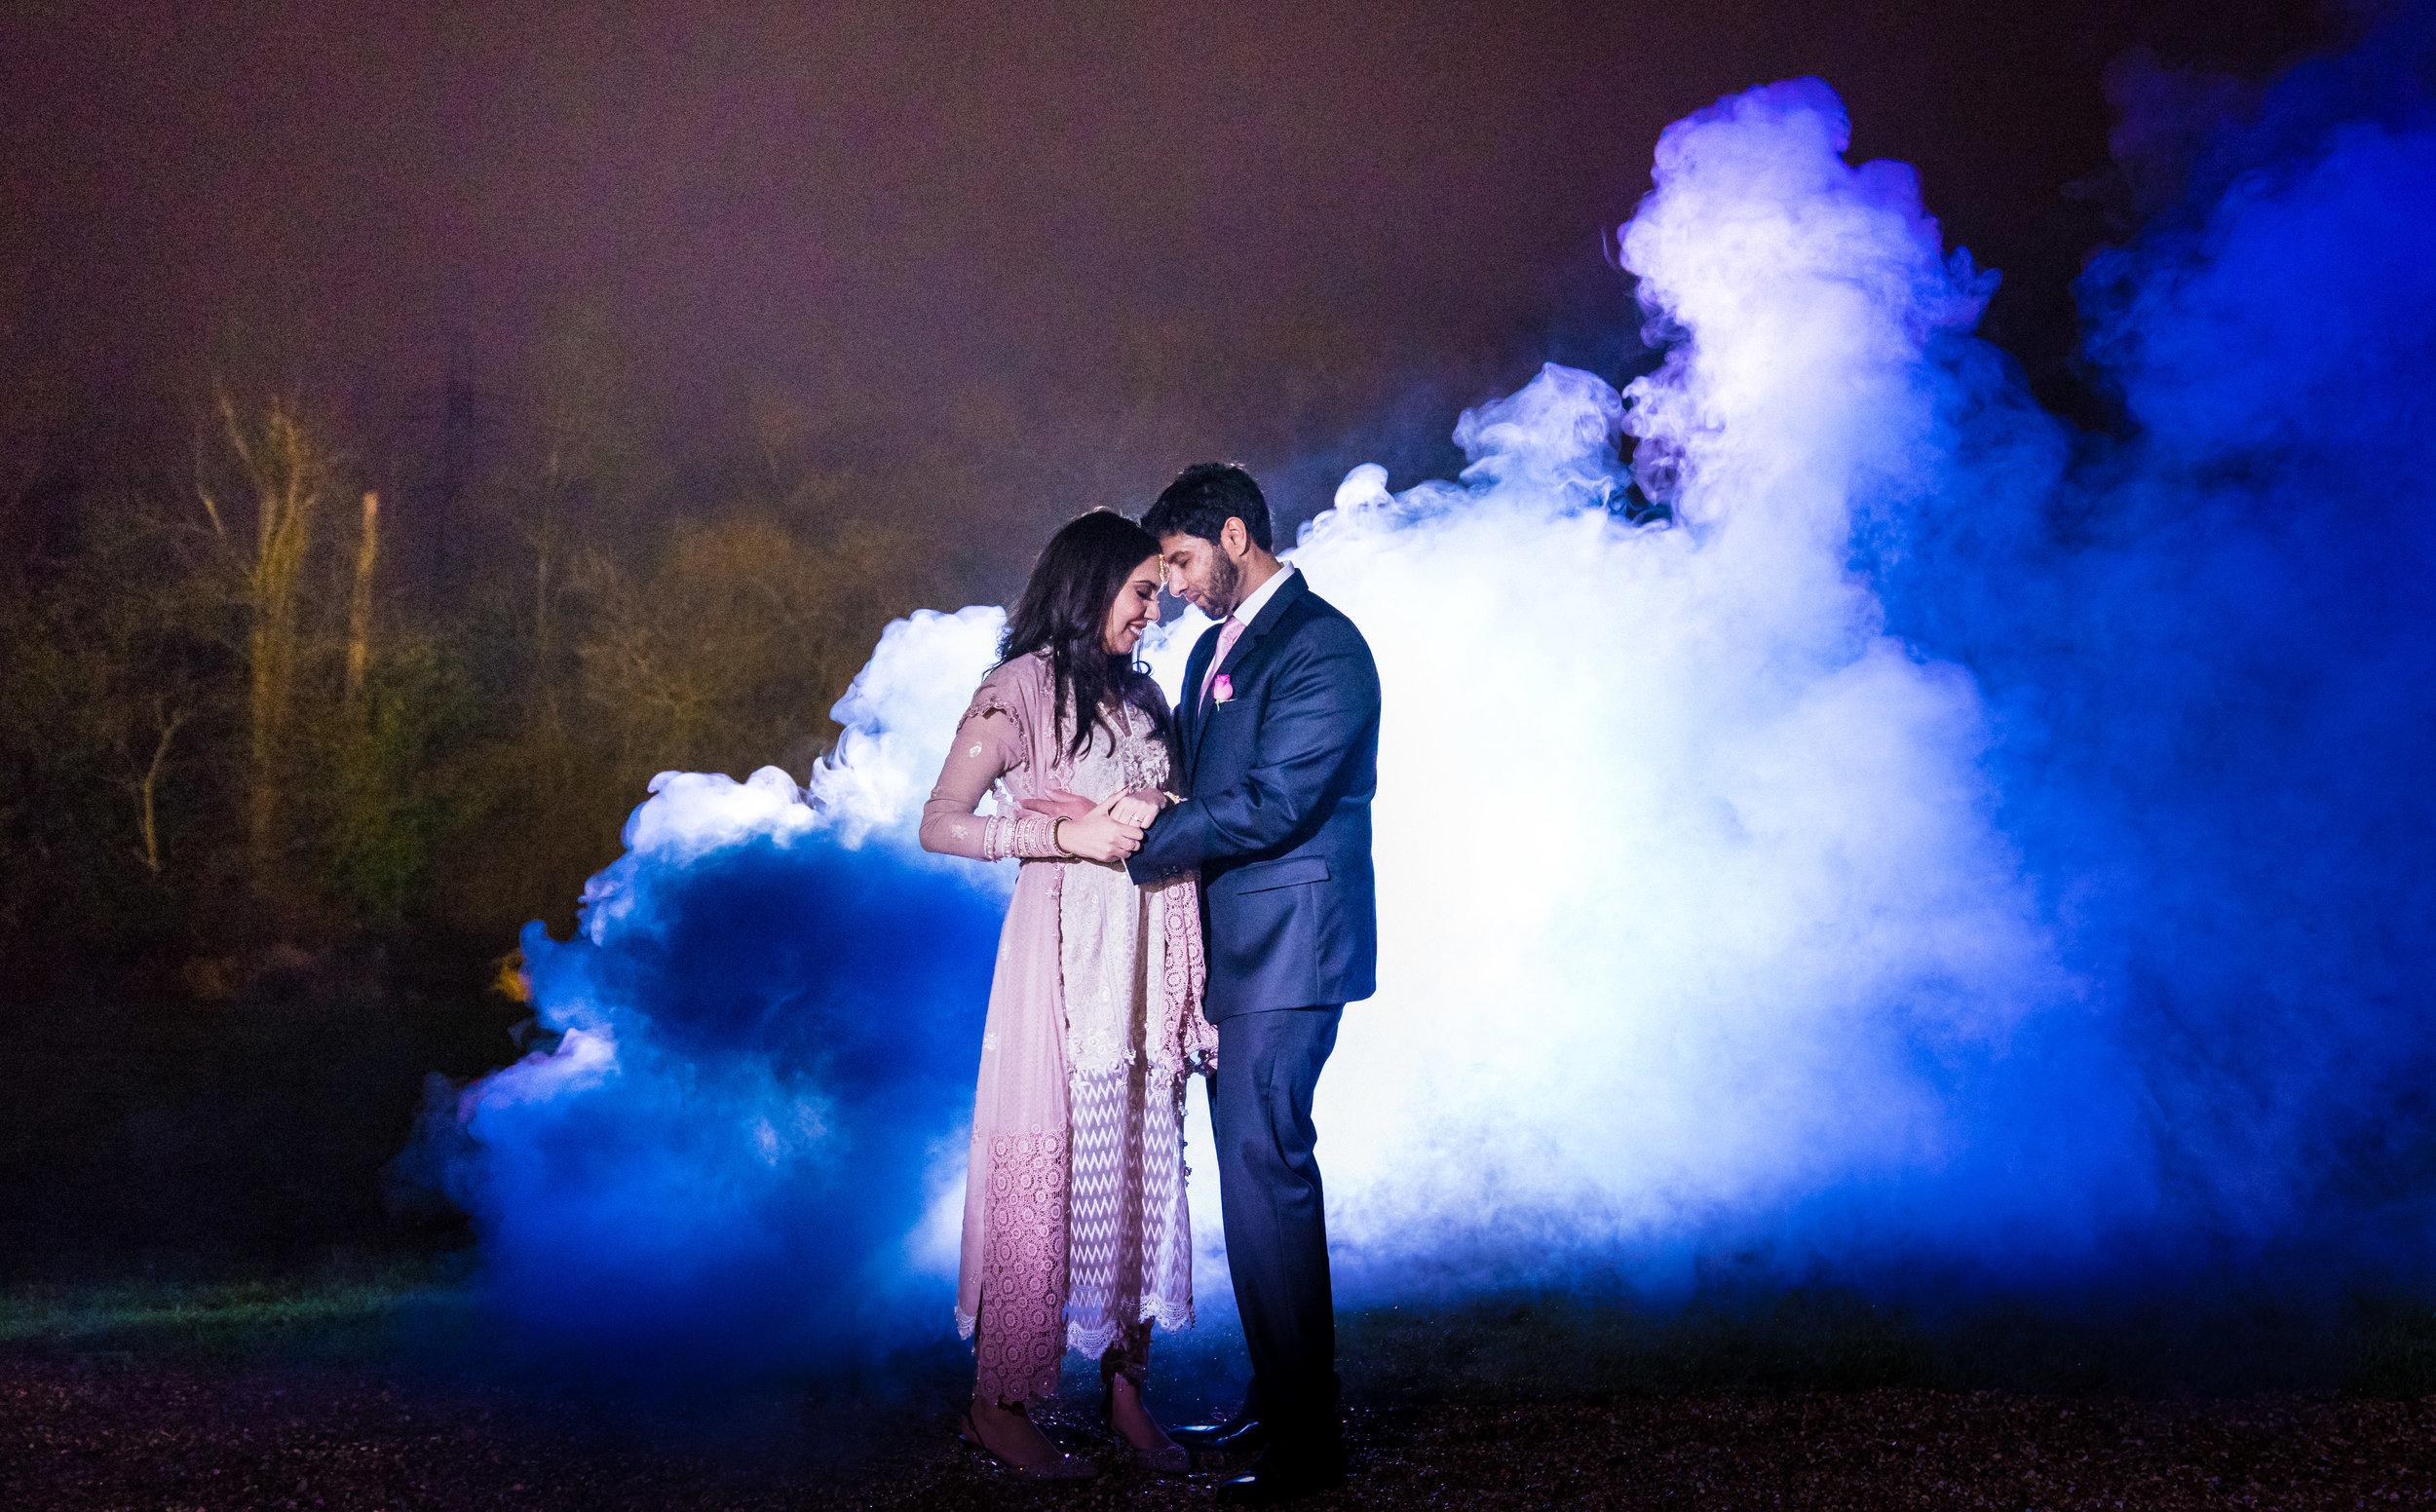 buckinghamshire-london-winter-wedding-photography-videography-smokebomb-01